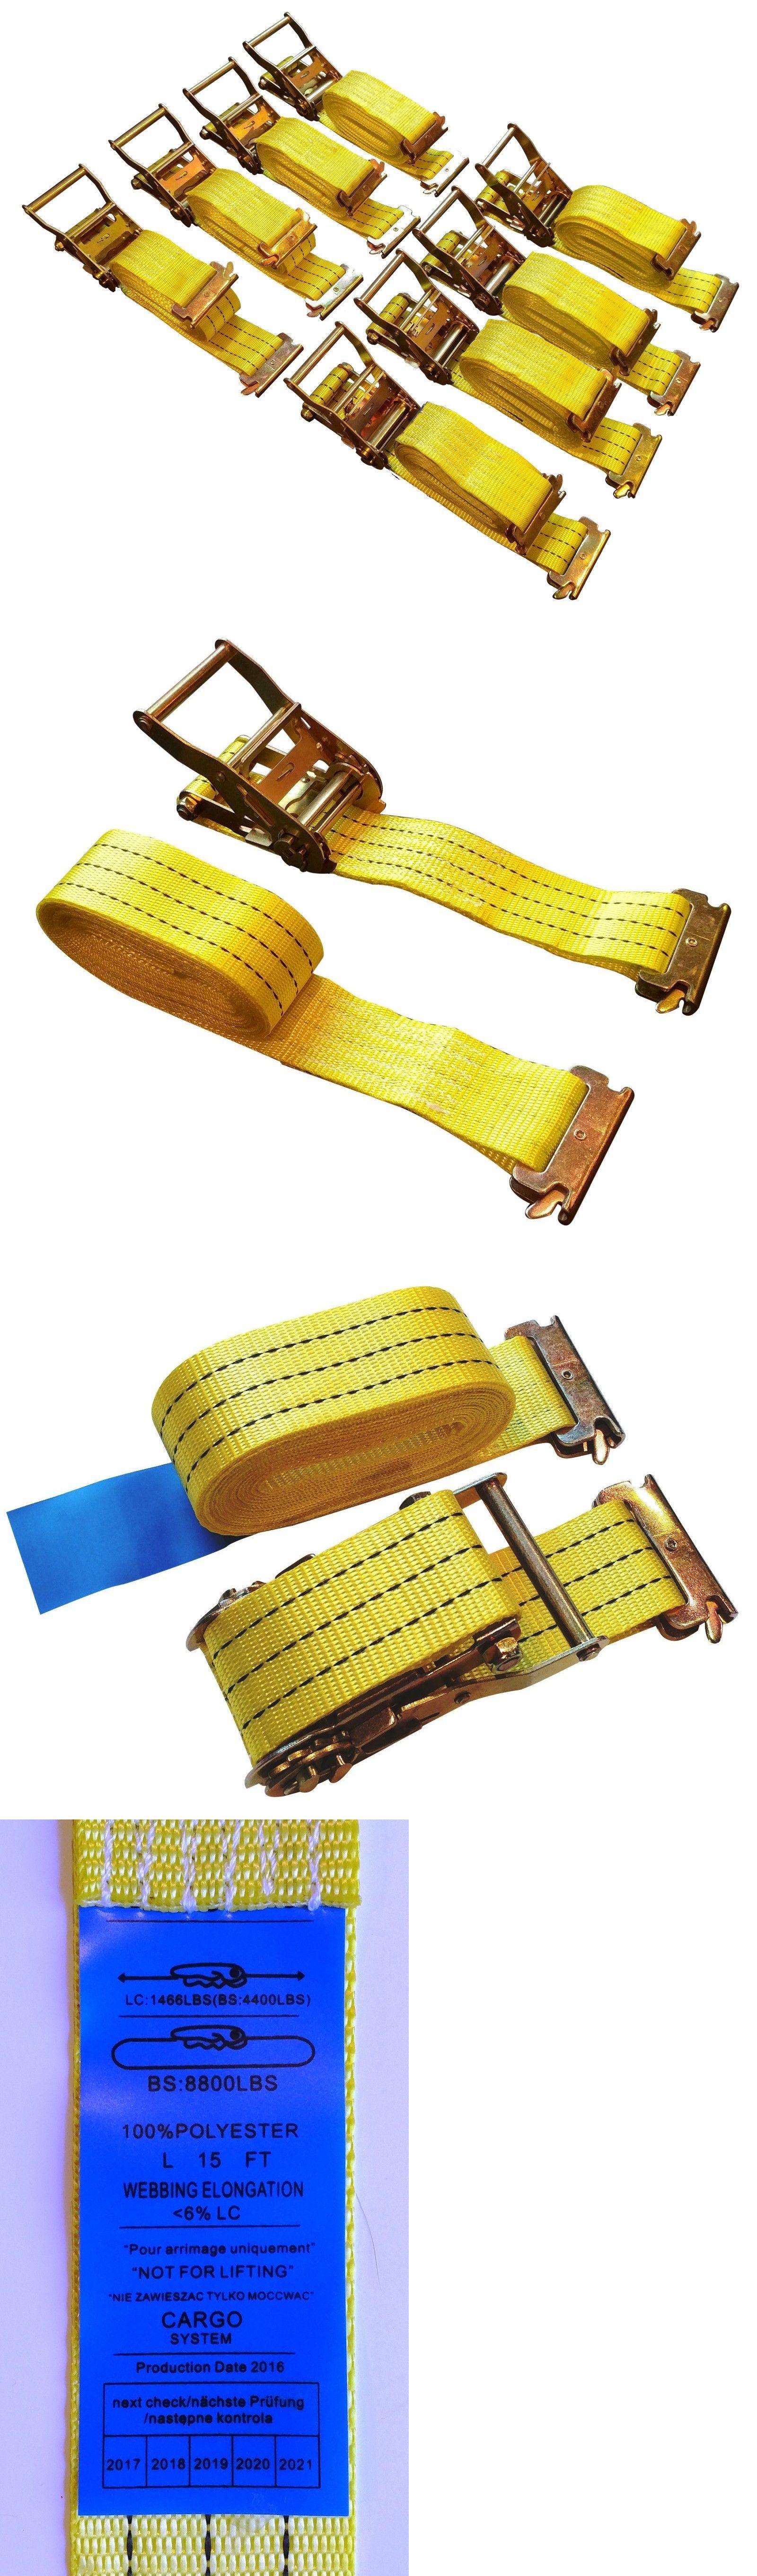 Details about 8pack 15 etrack ratchet tie down strap